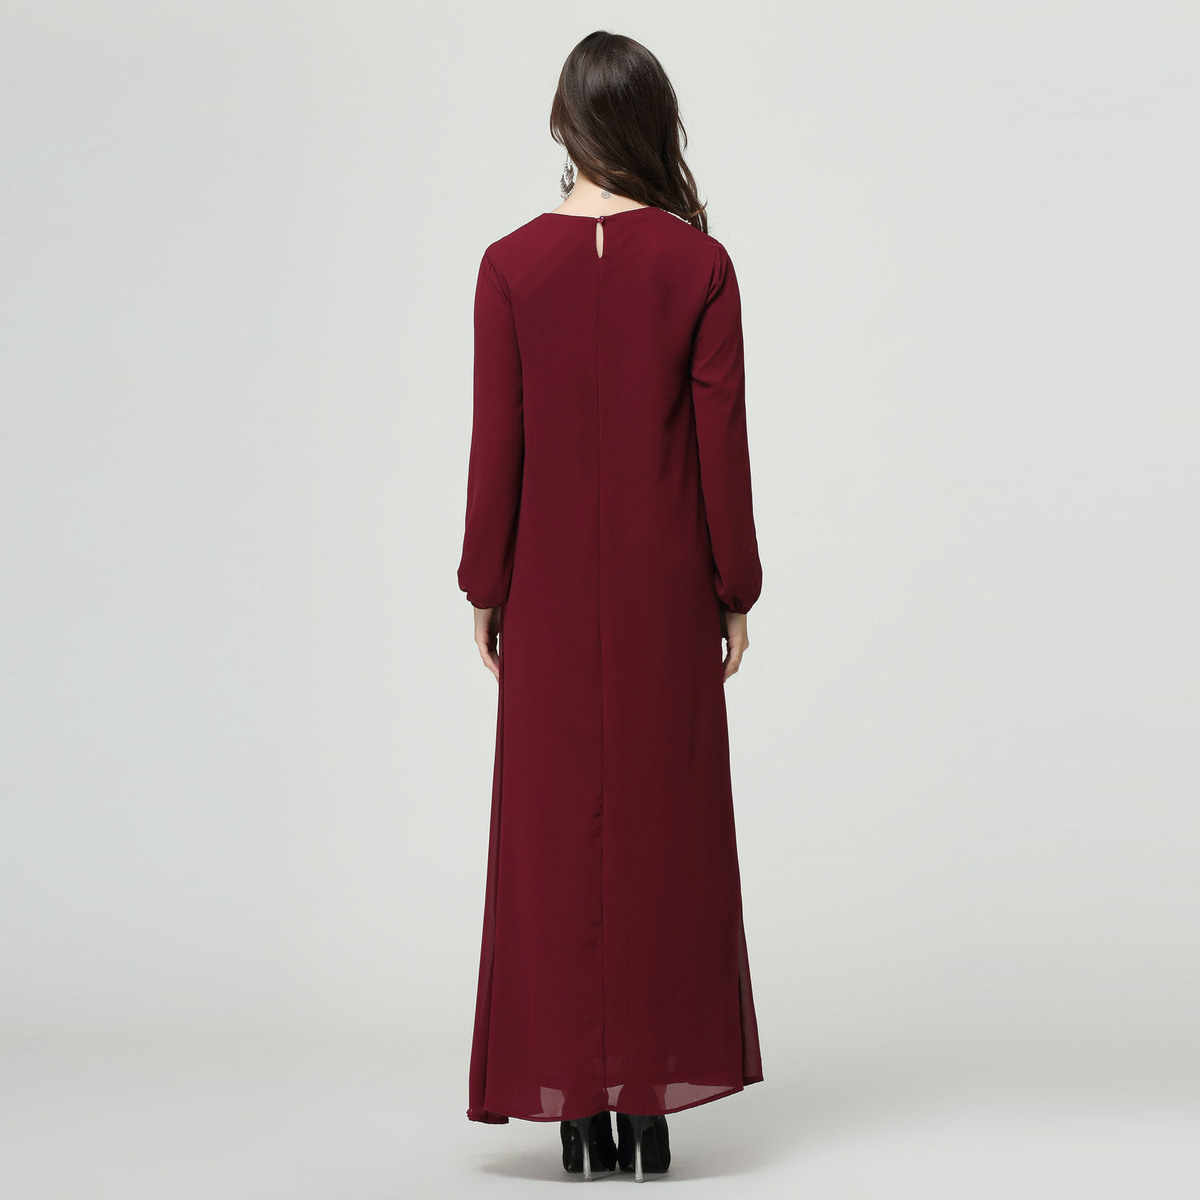 YOCALOR 7XL 이슬람 의류 아랍 로브 레이스 여름 두바이 여성 복장 플러스 사이즈 6l 긴 맥시 소녀 Abaya Jalabiya 이슬람 Kaftan